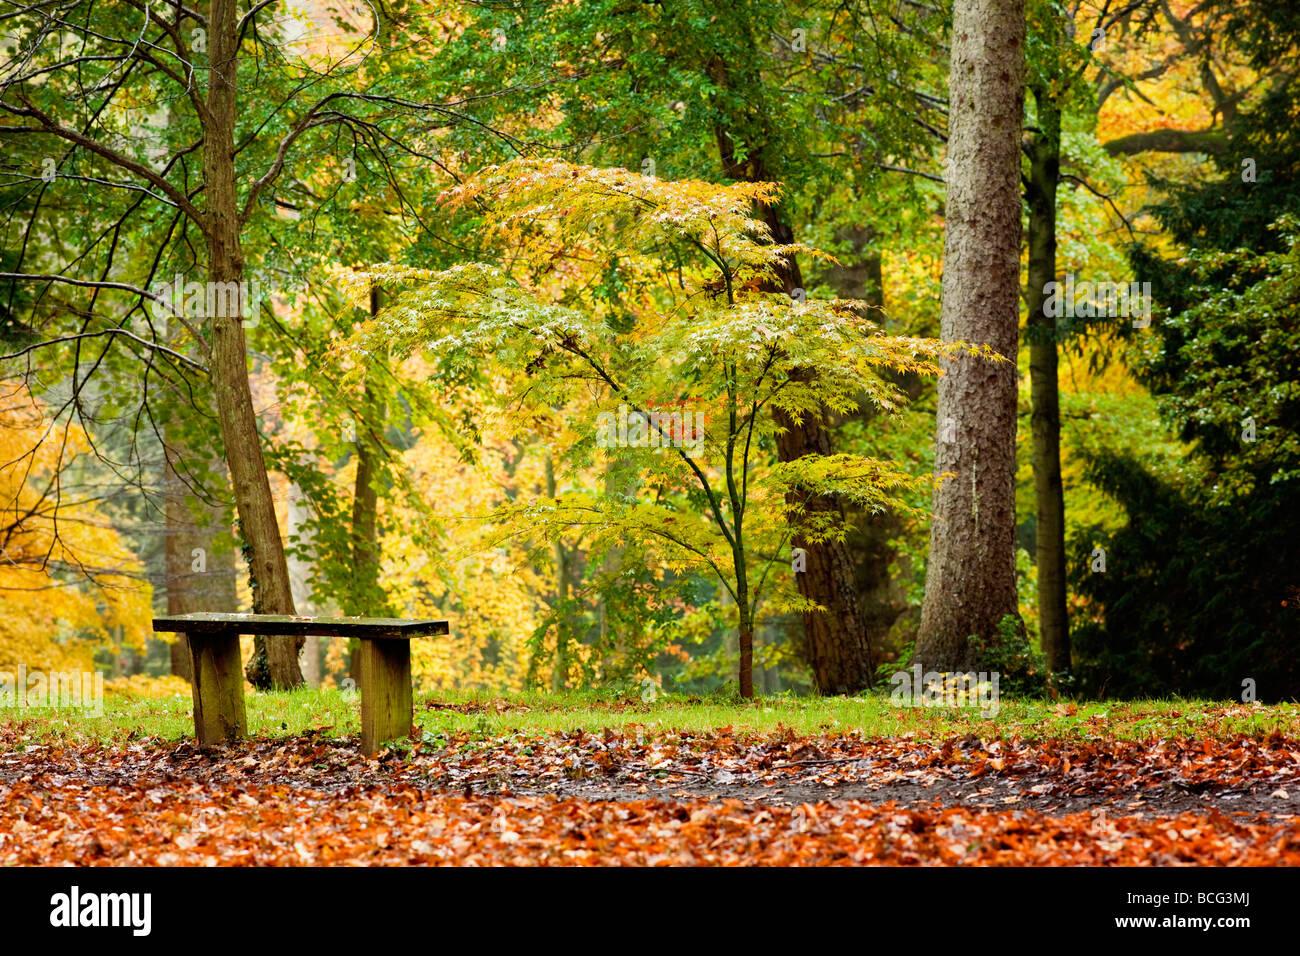 Autumn colours at Thorp Perrow Arboretum, Yorkshire UK - Stock Image